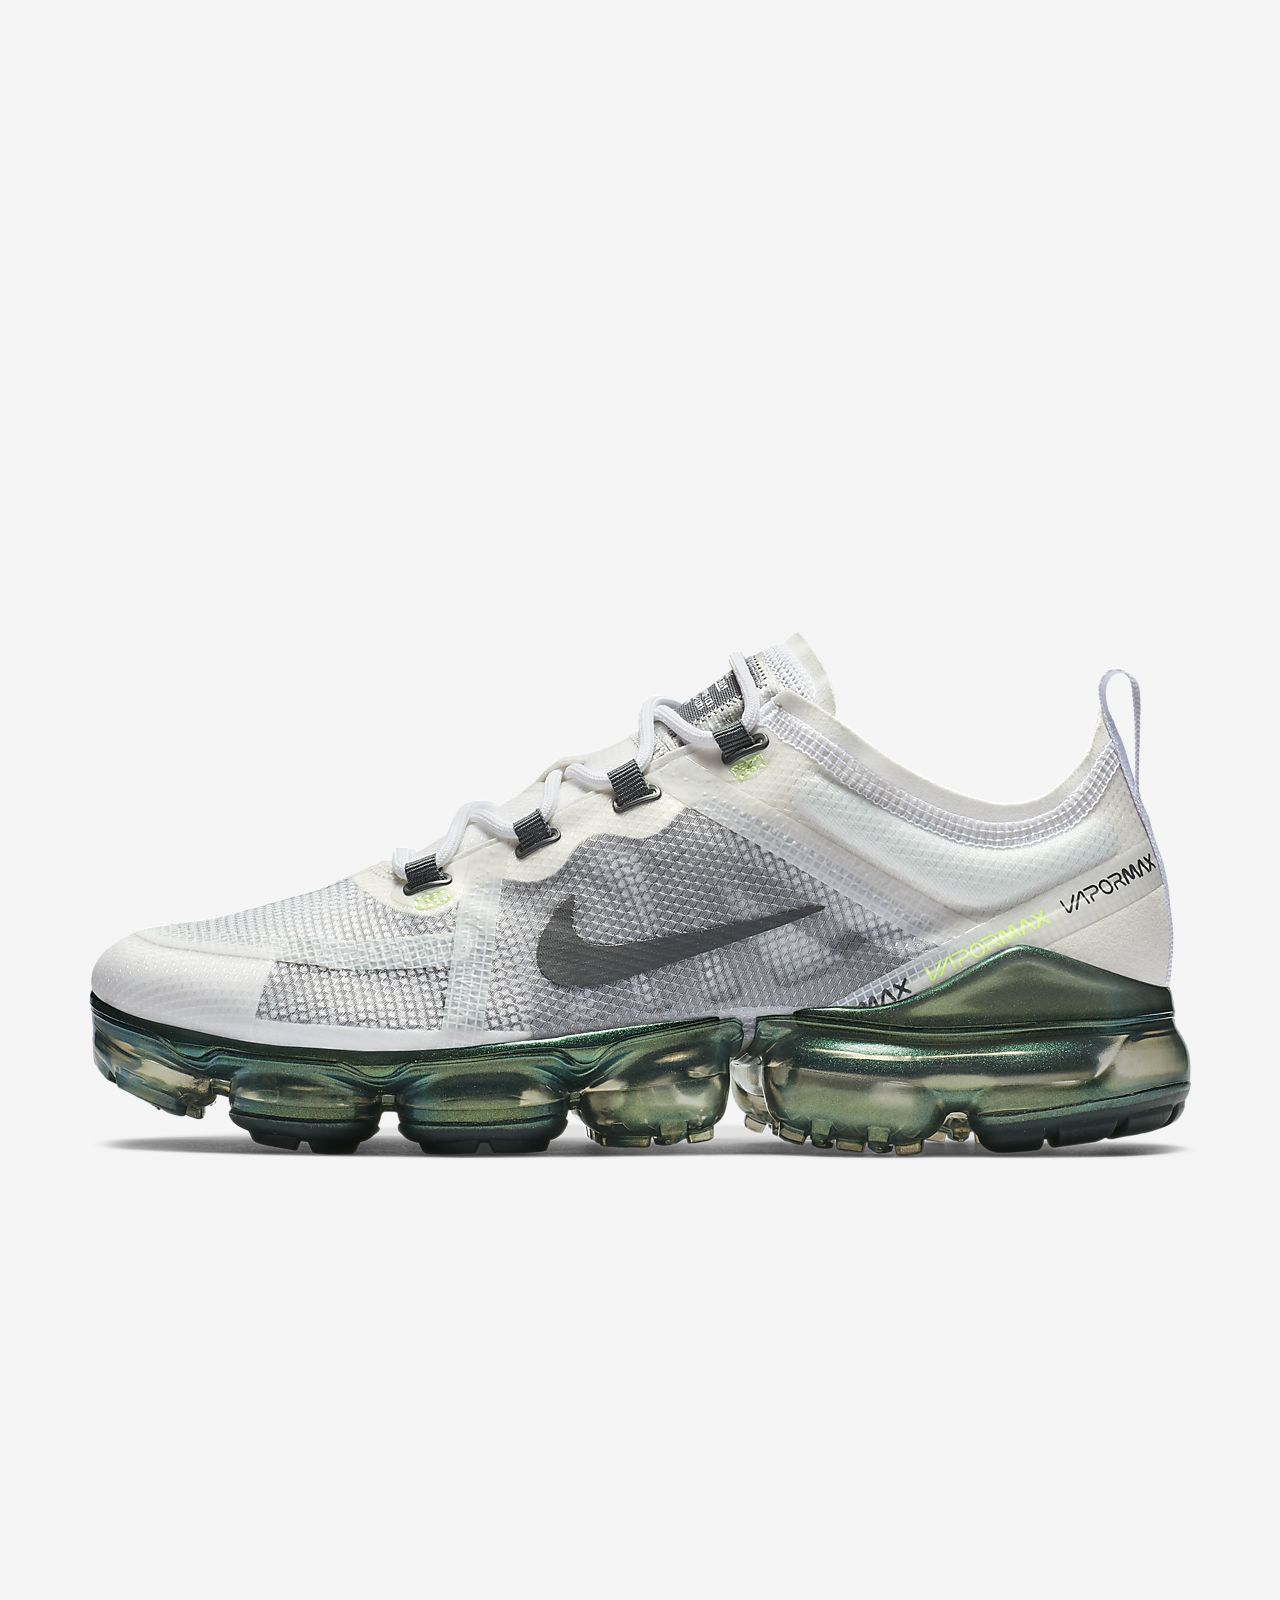 Nike Air VaporMax 2019 Premium Schoen